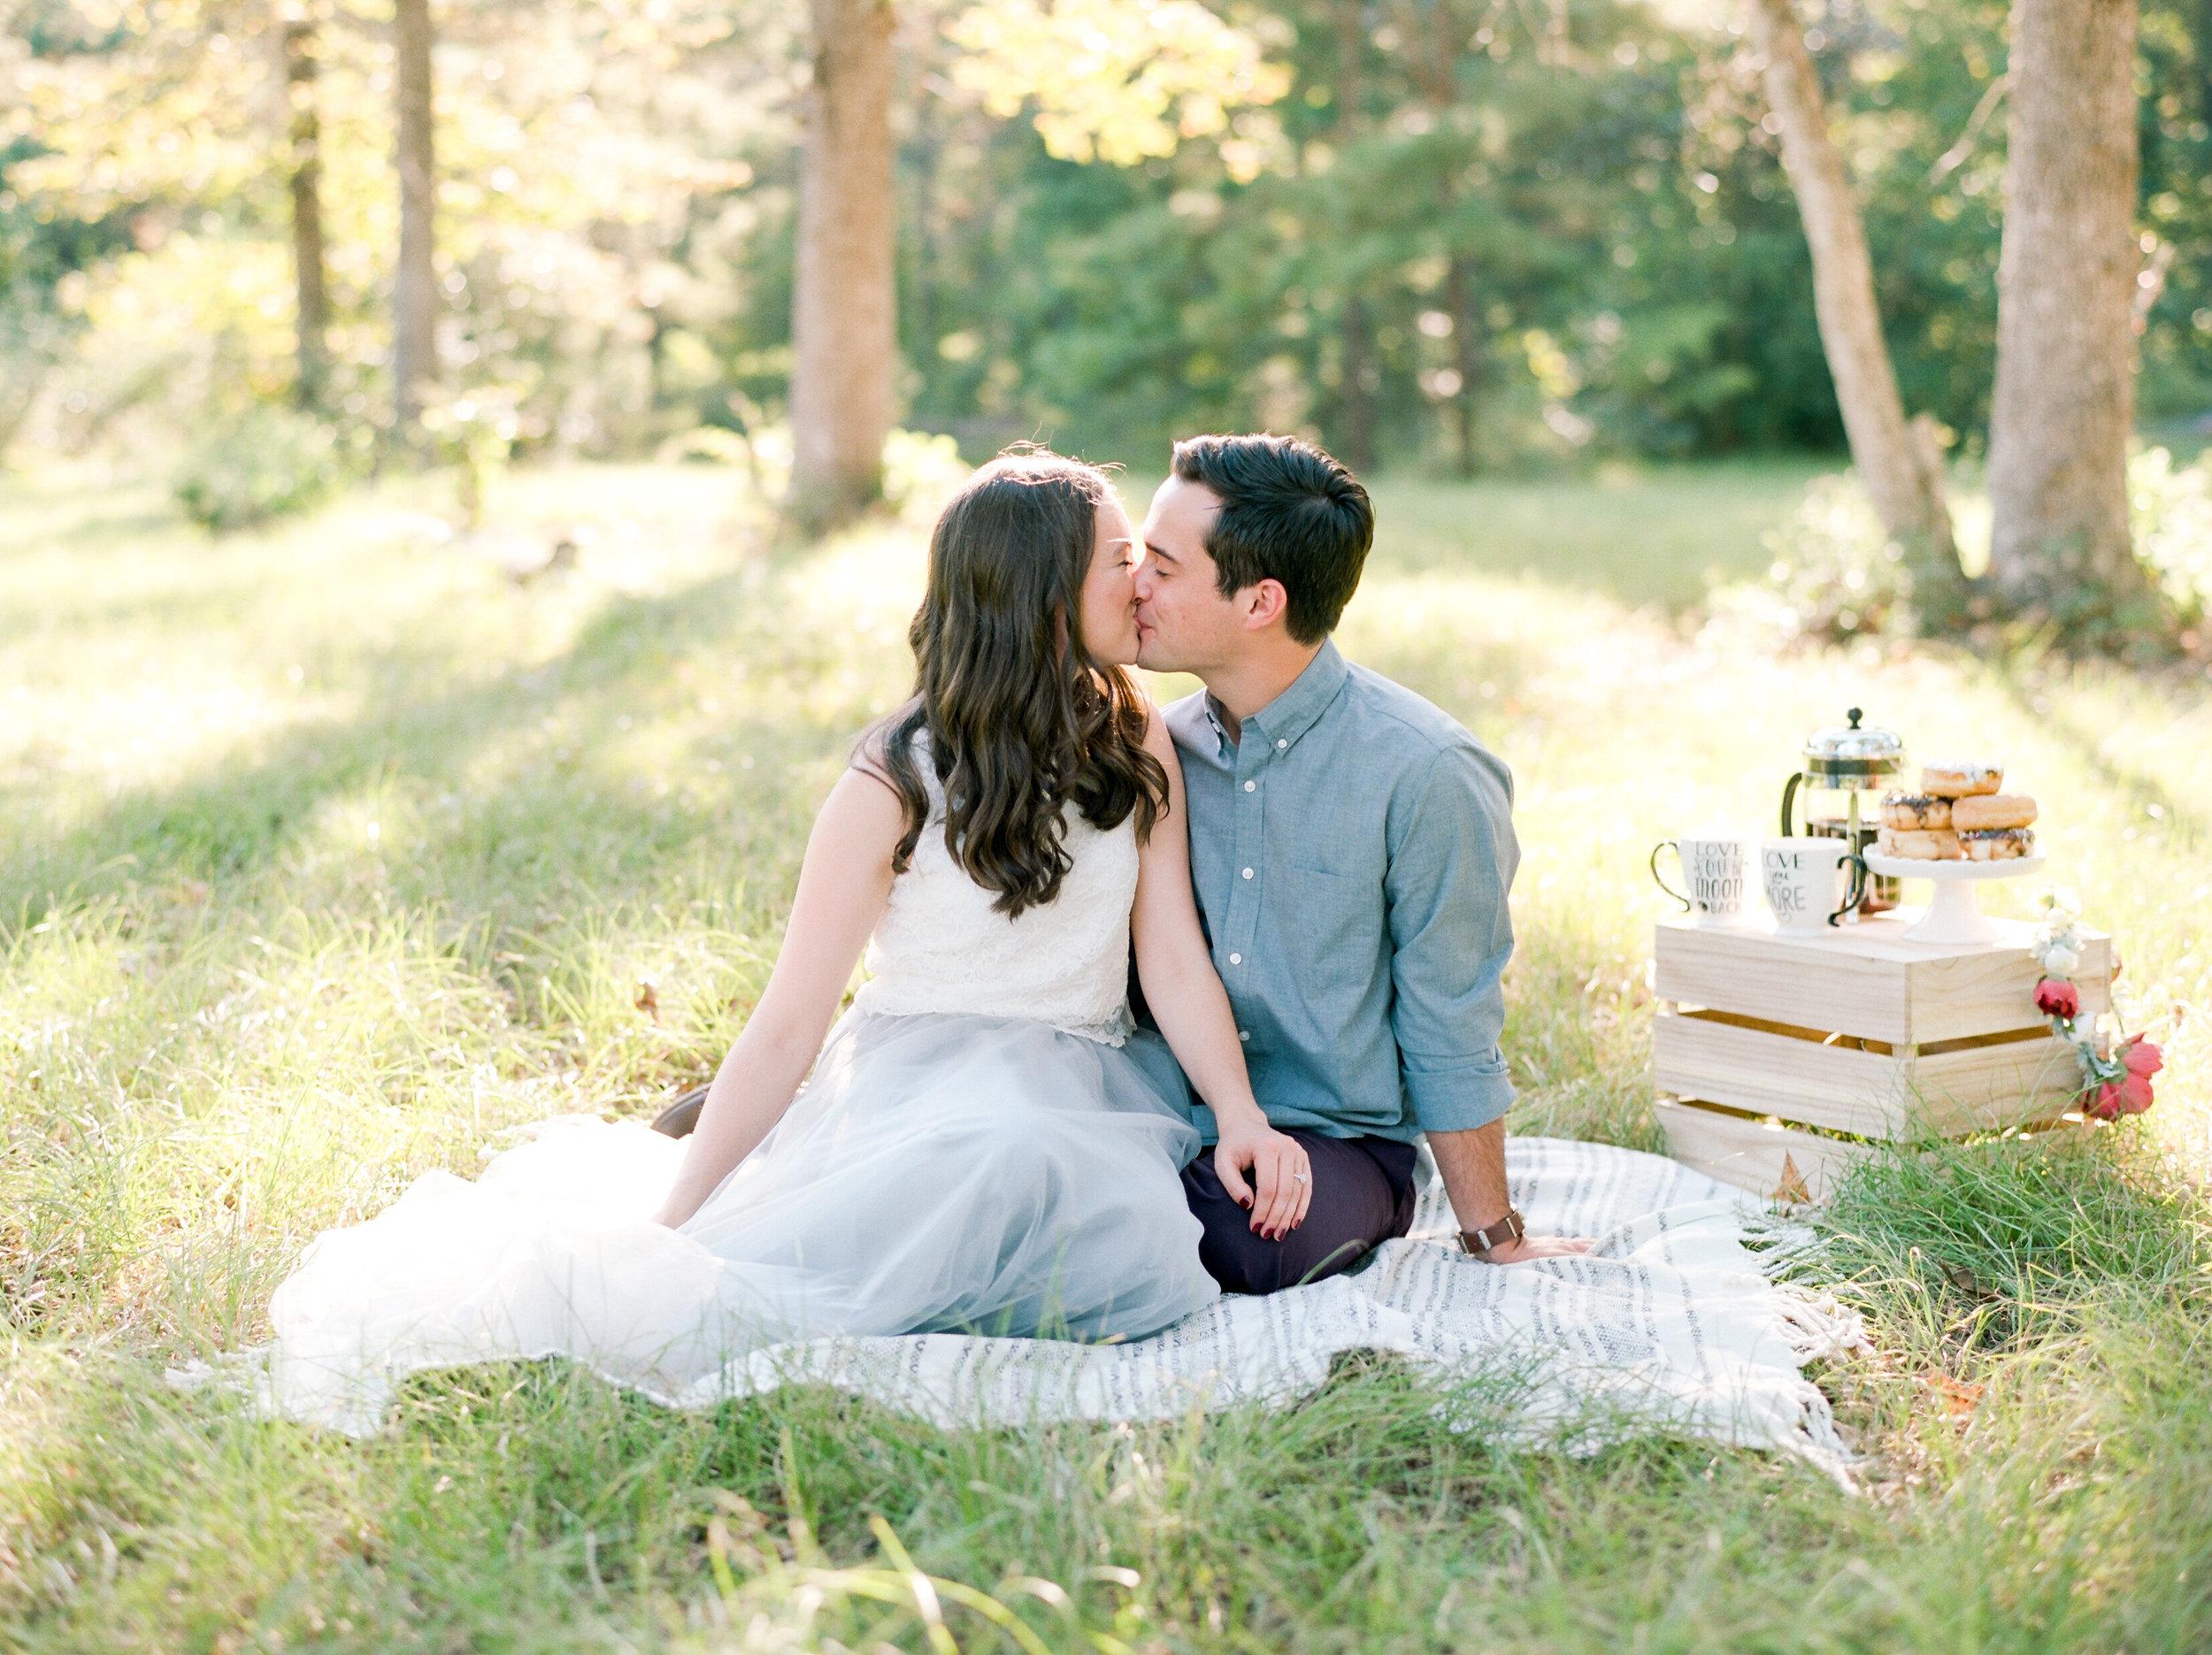 houston-wedding-photographer-college-station-austin-the-woodlands-film-photography-style-me-pretty-engagements-dana-fernandez-photography-10.jpg